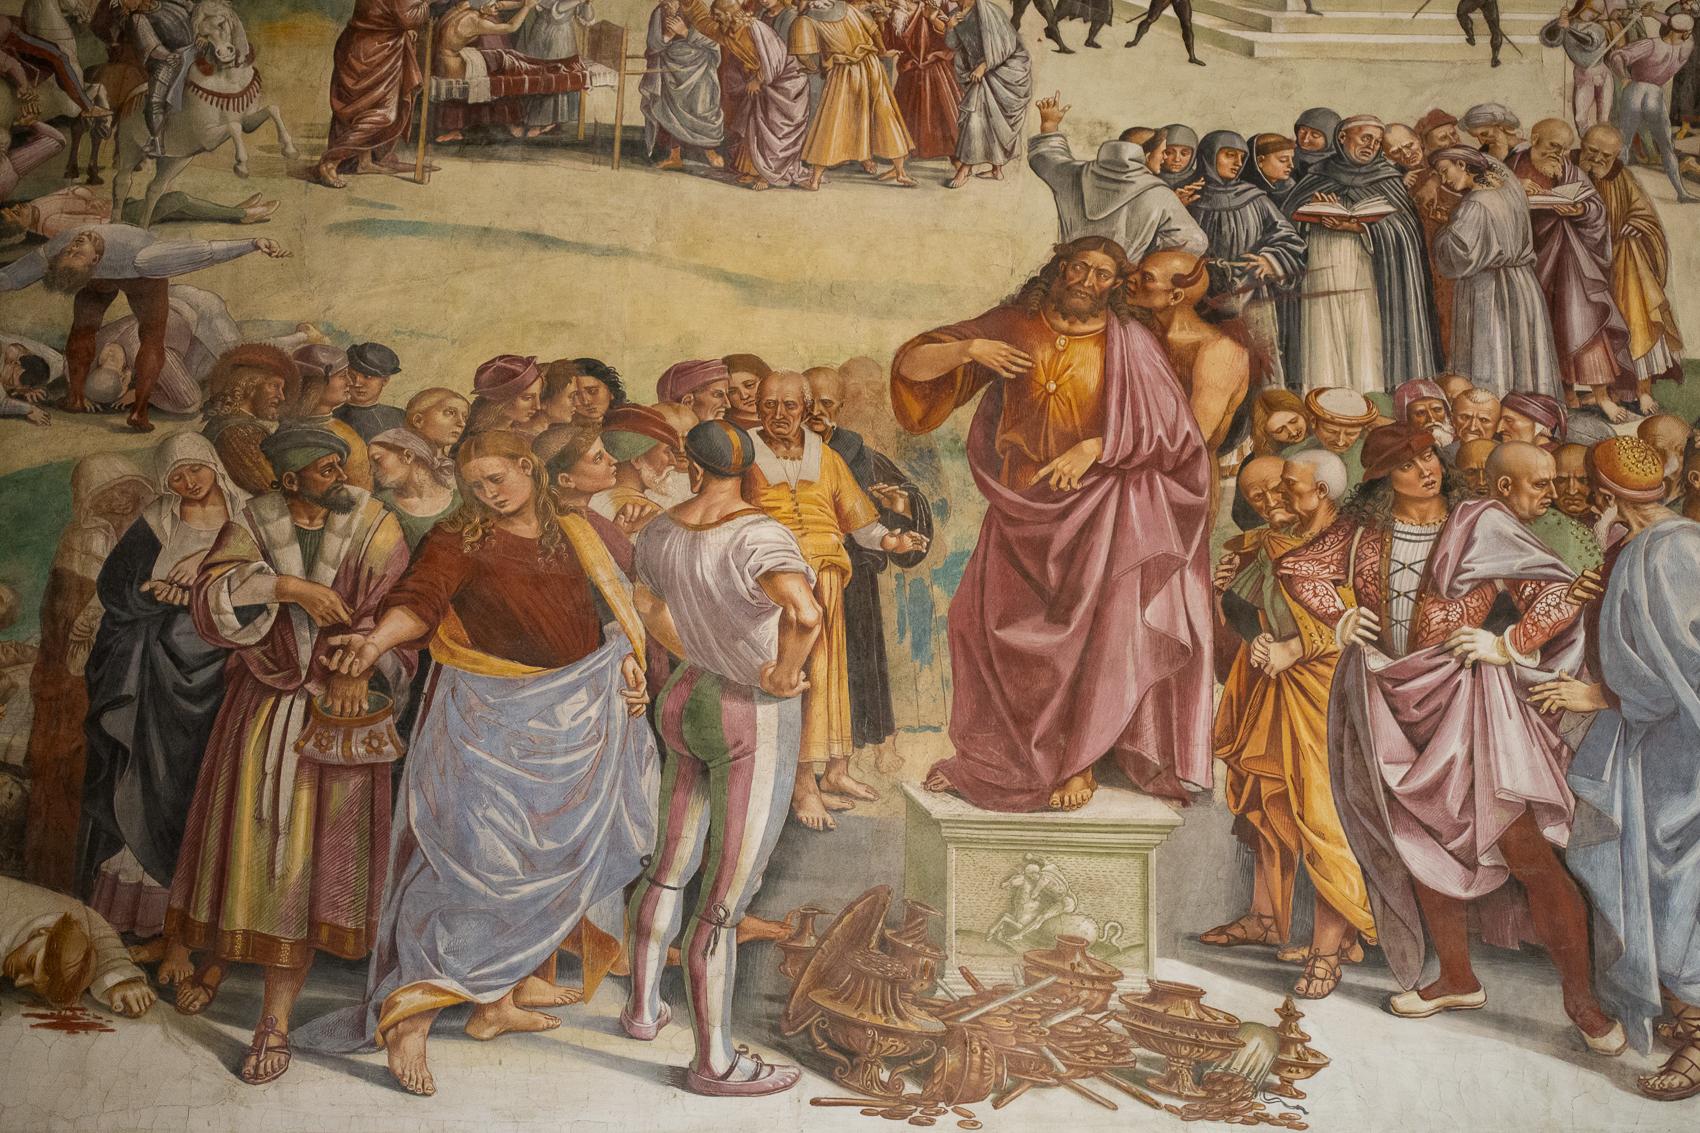 Antichrist, devil and usurious Jew